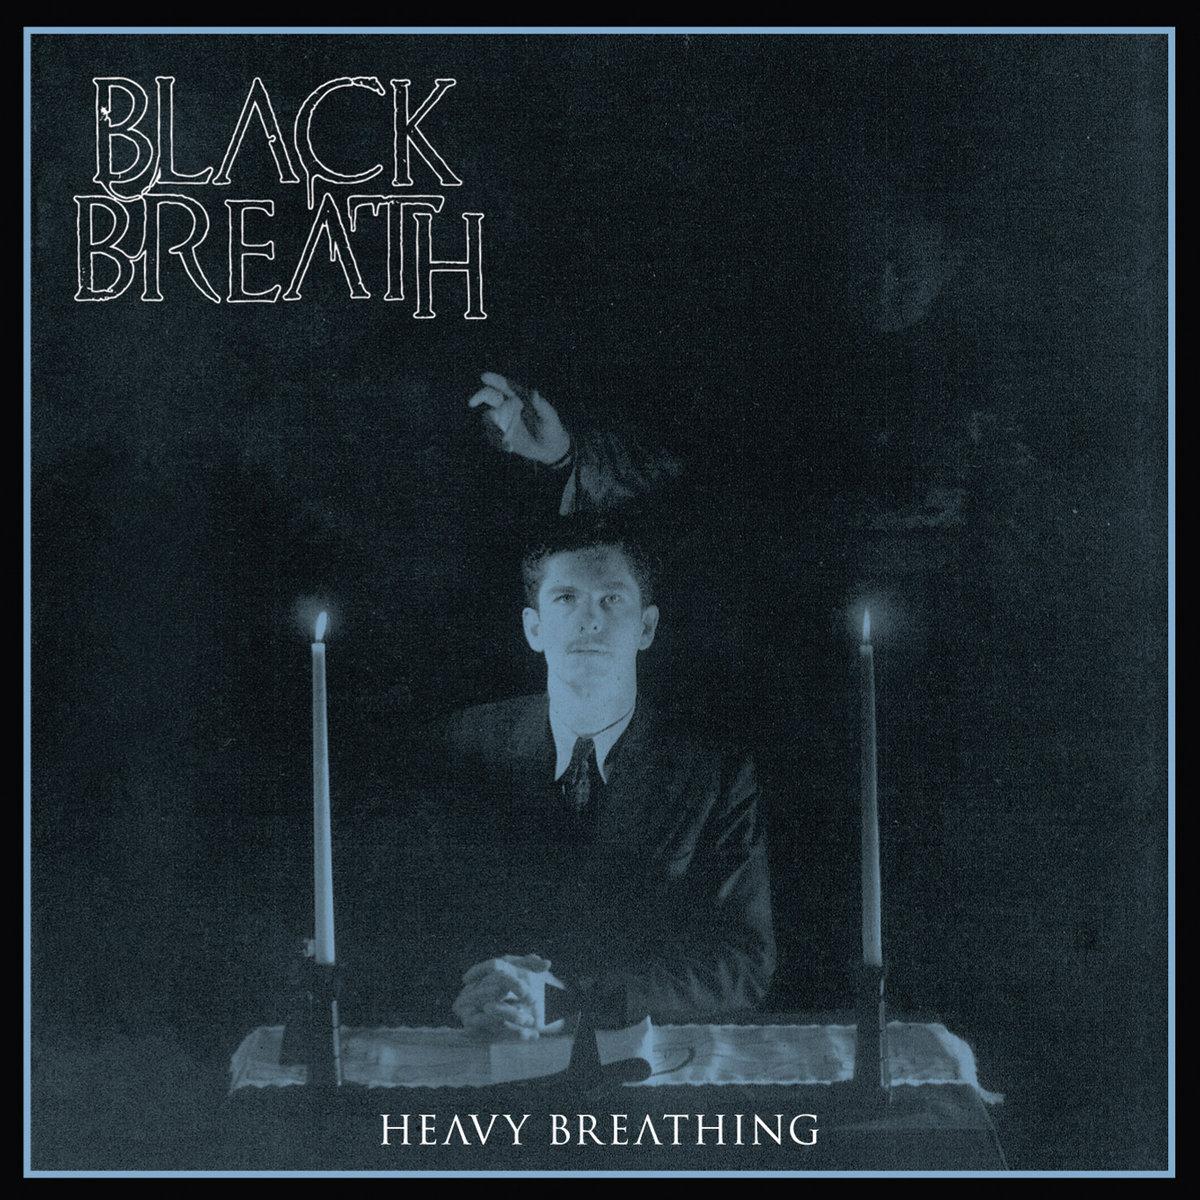 Heavy breathing | black breath.